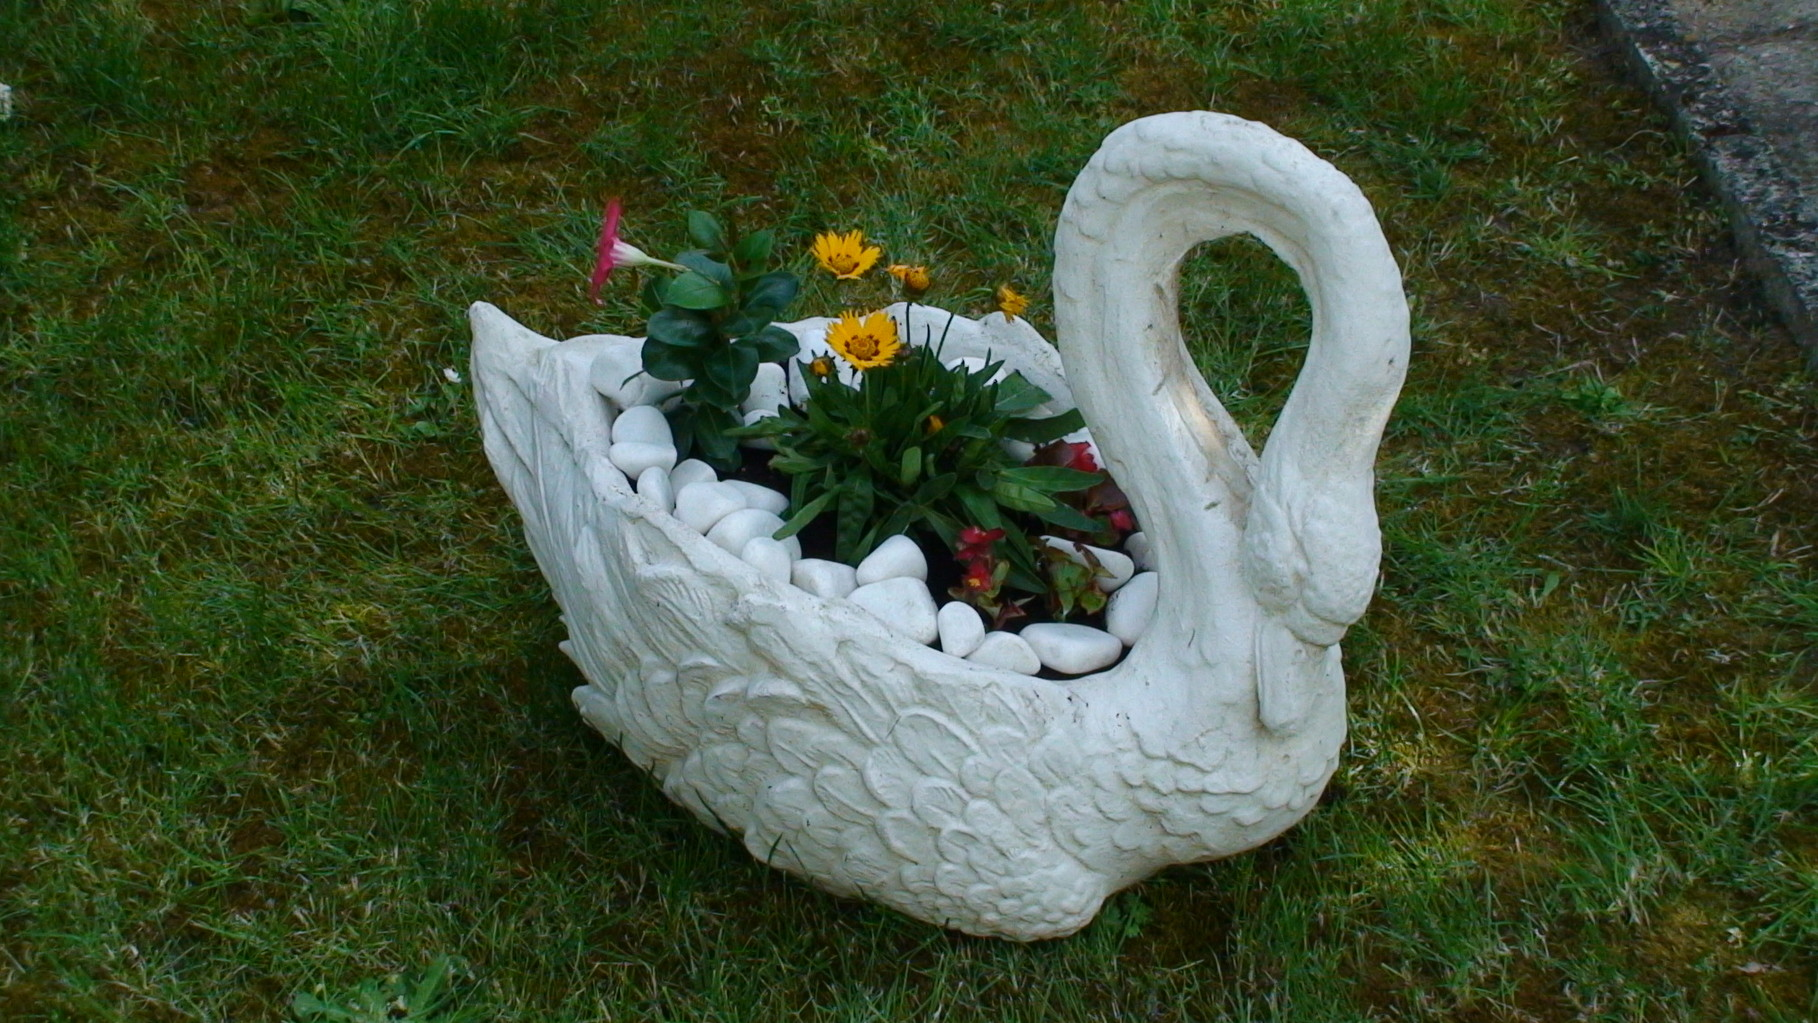 un cygne s'est posé au jardin